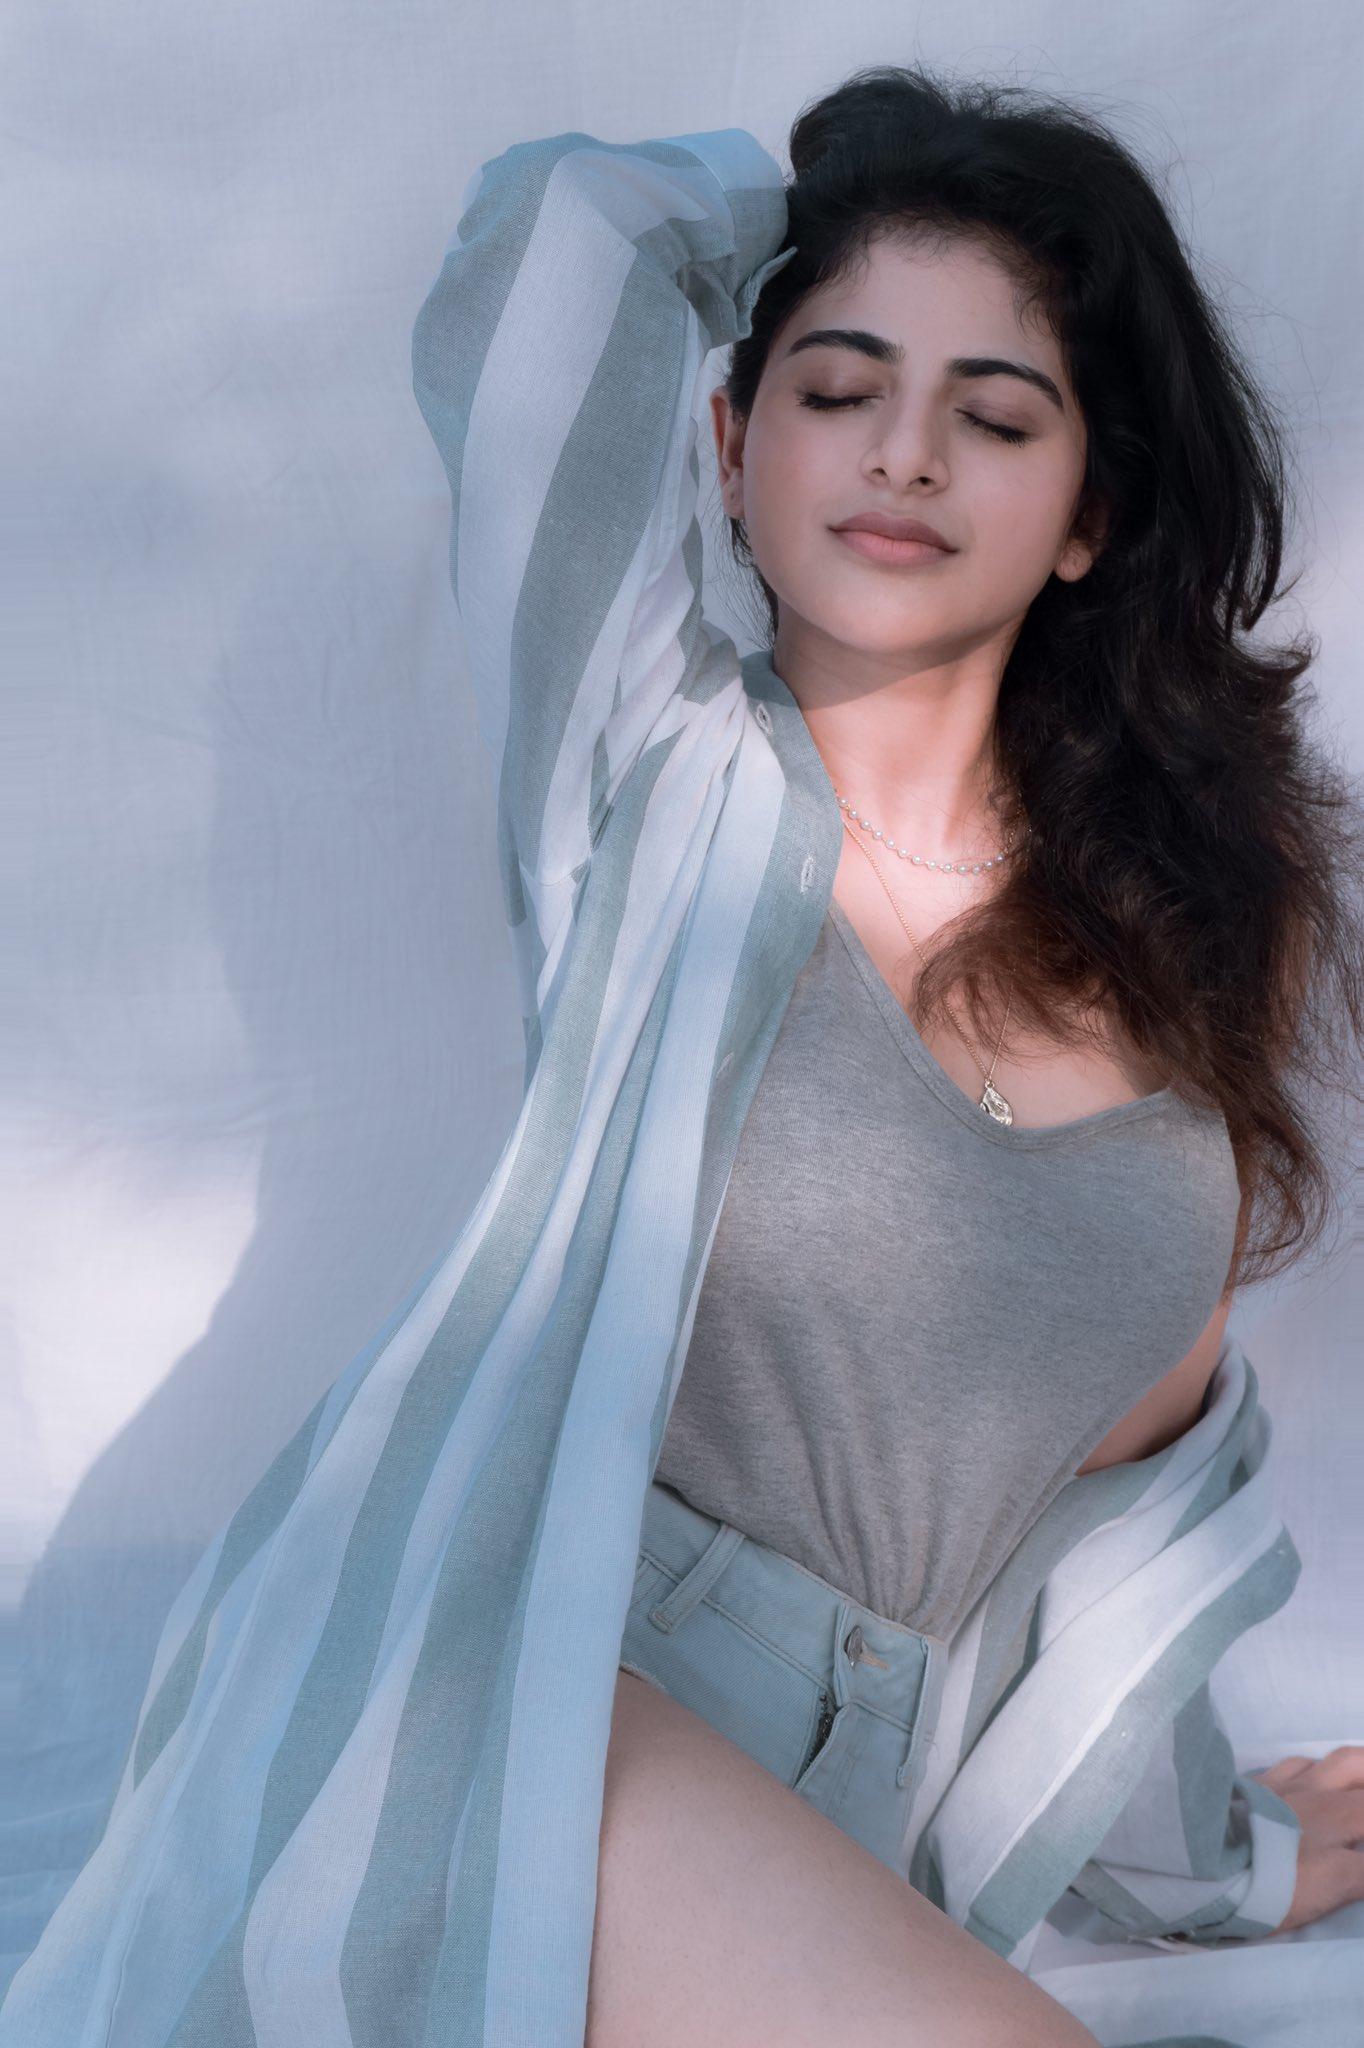 Iswarya Menon Latest Pictures,Iswarya Menon recent pics, Iswarya Menon sexy photos, Iswarya Menon in denim, Iswarya Menon hot , Iswarya Menon thighs